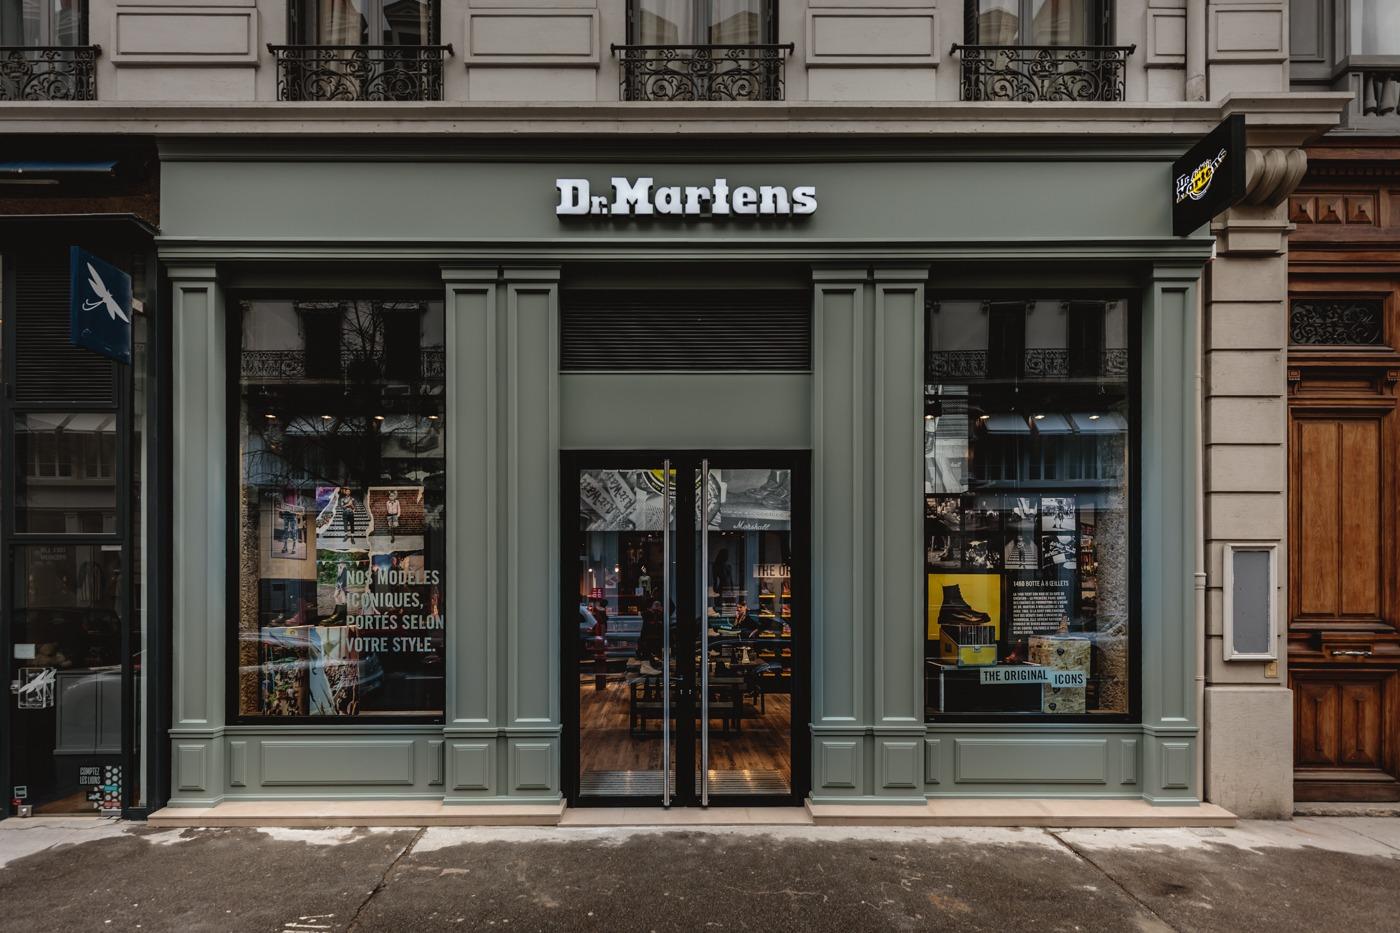 © www.gaetan-clement.fr Dr Martens - Lyon 2018